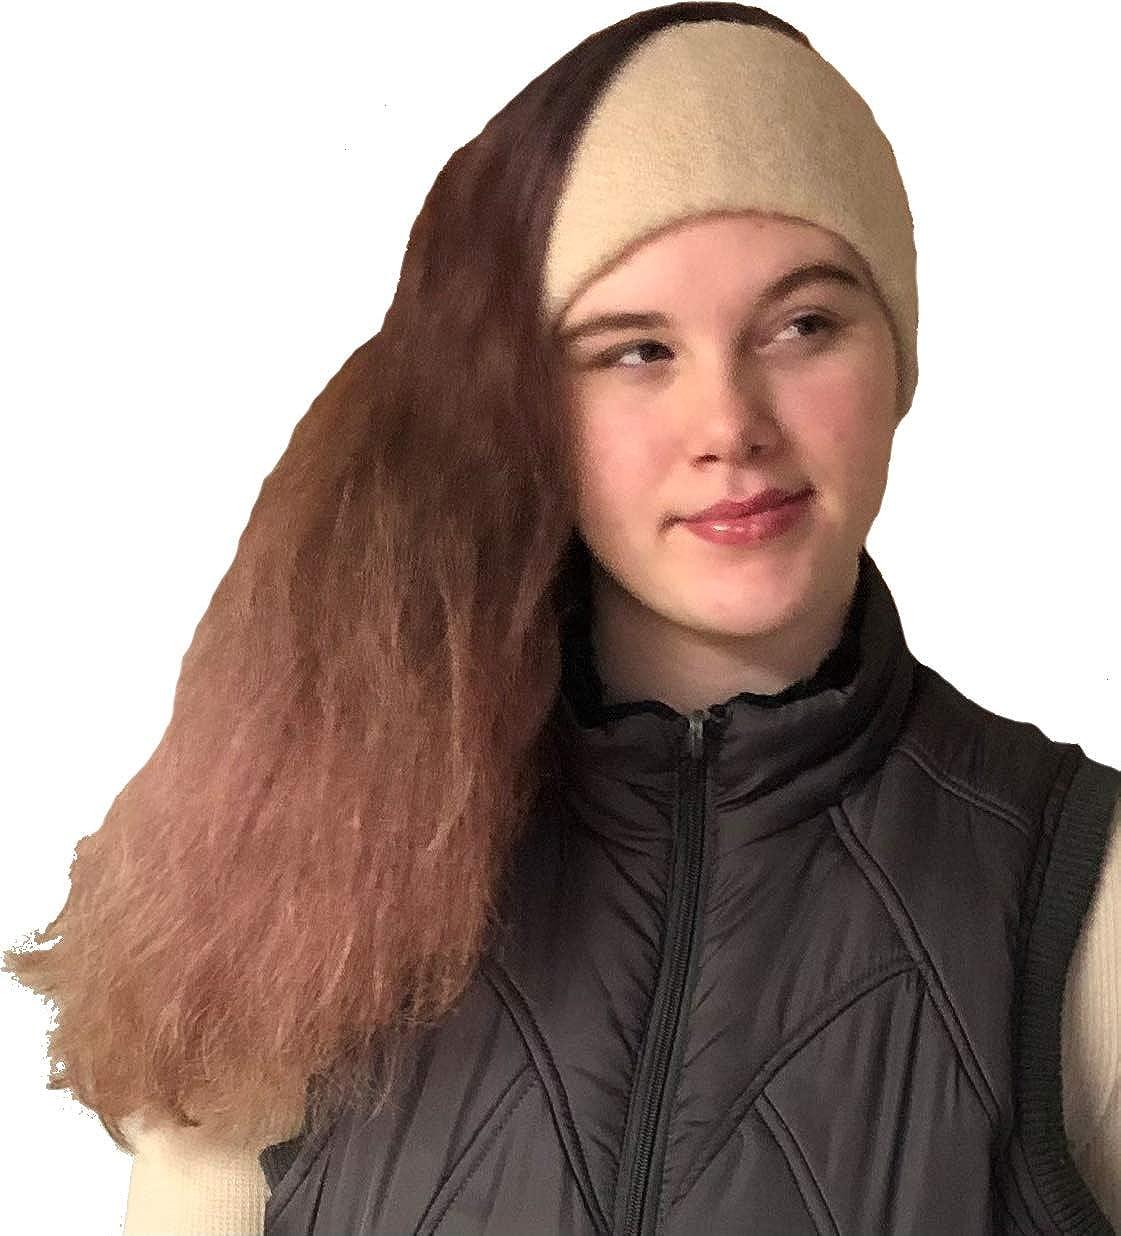 Peruvian Link Alpaca Ear Warmer Headband - Sand